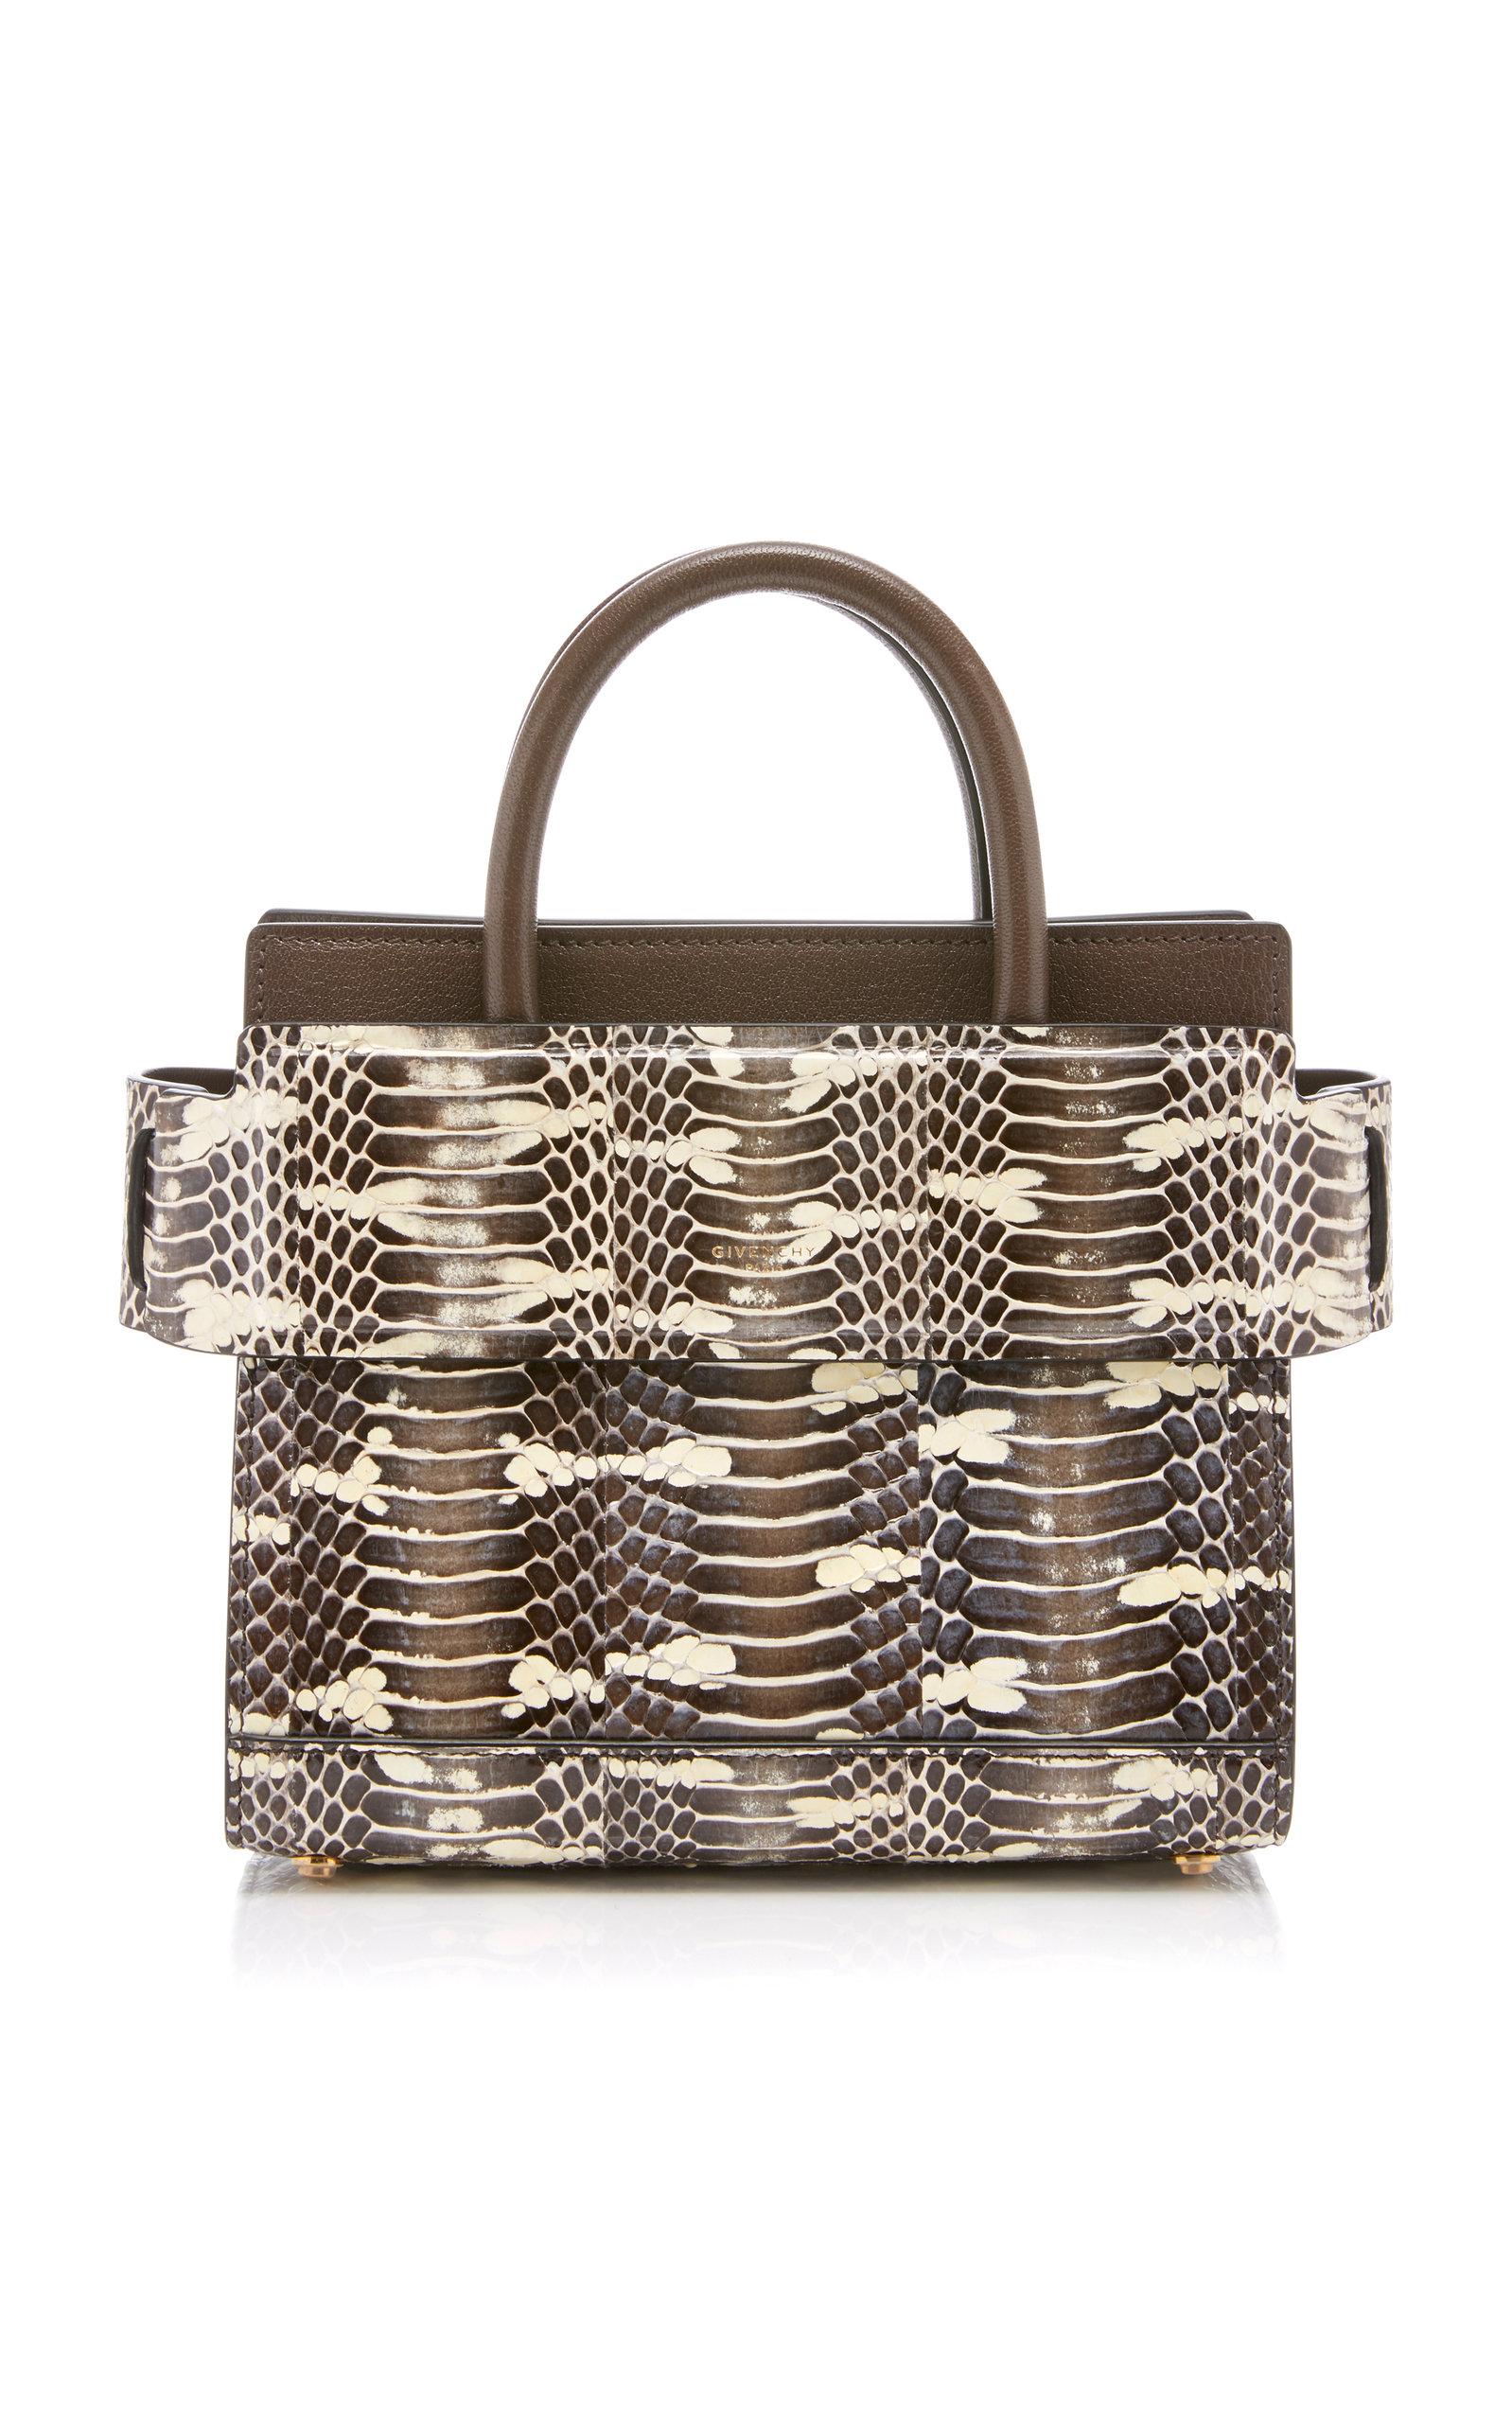 ffac6f1b91 Mini Horizon Leather Bag by Givenchy